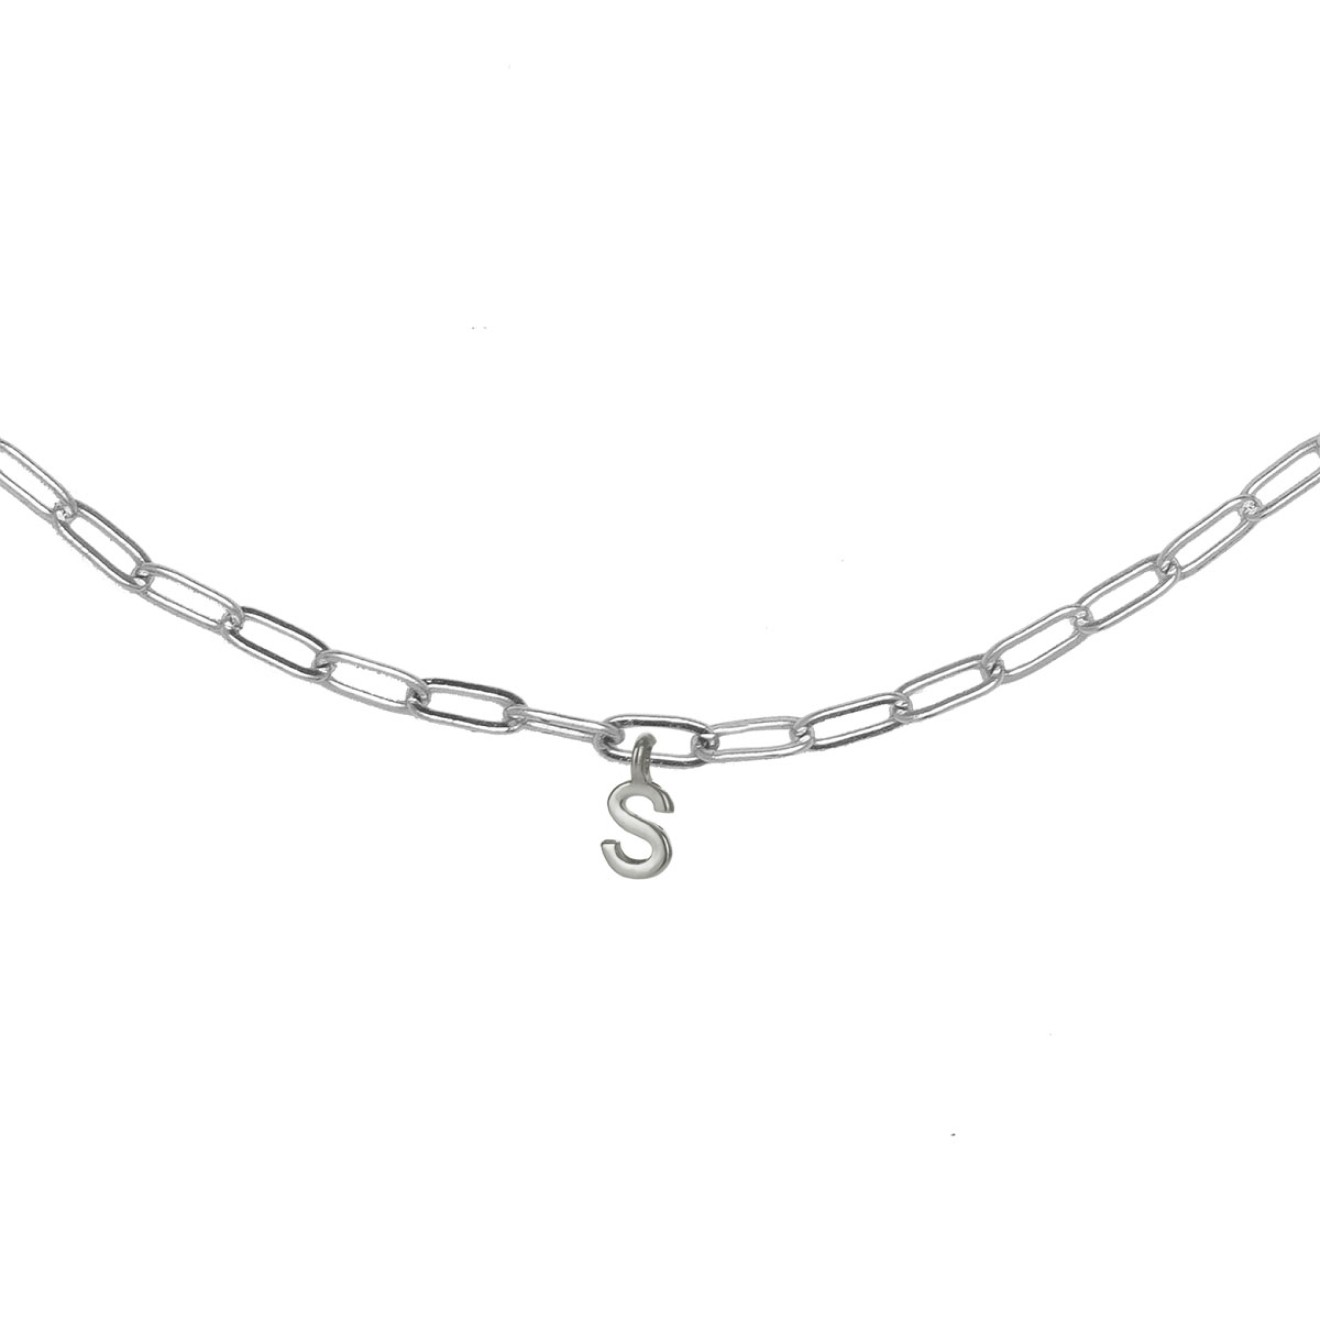 Фото - Ringstone Колье-цепь с буквой S ringstone жемчужное ожерелье с буквой s ringstone